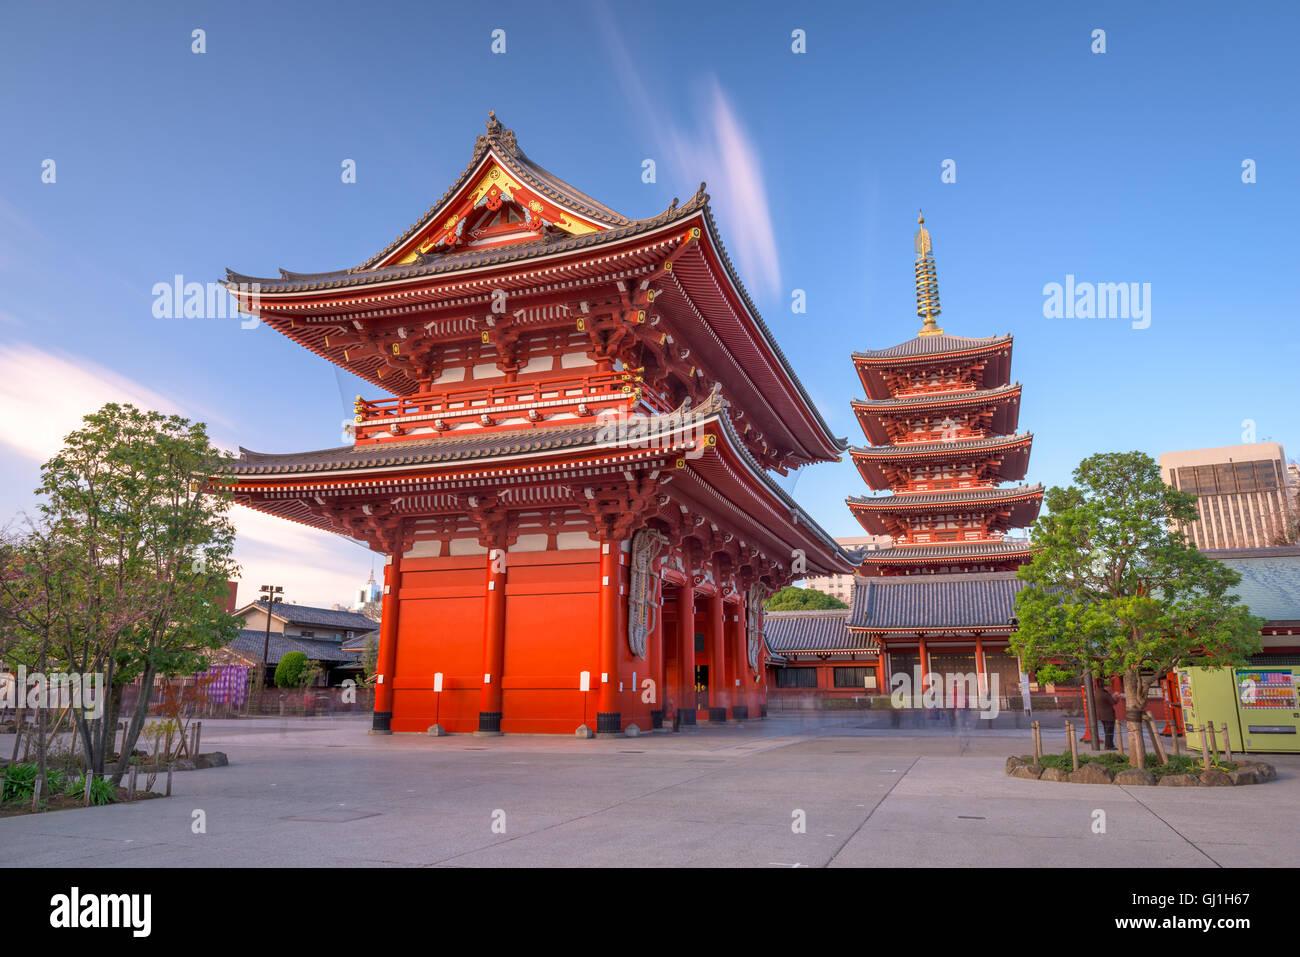 Sensoji Temple in Asakusa, tokyo, Japan. - Stock Image